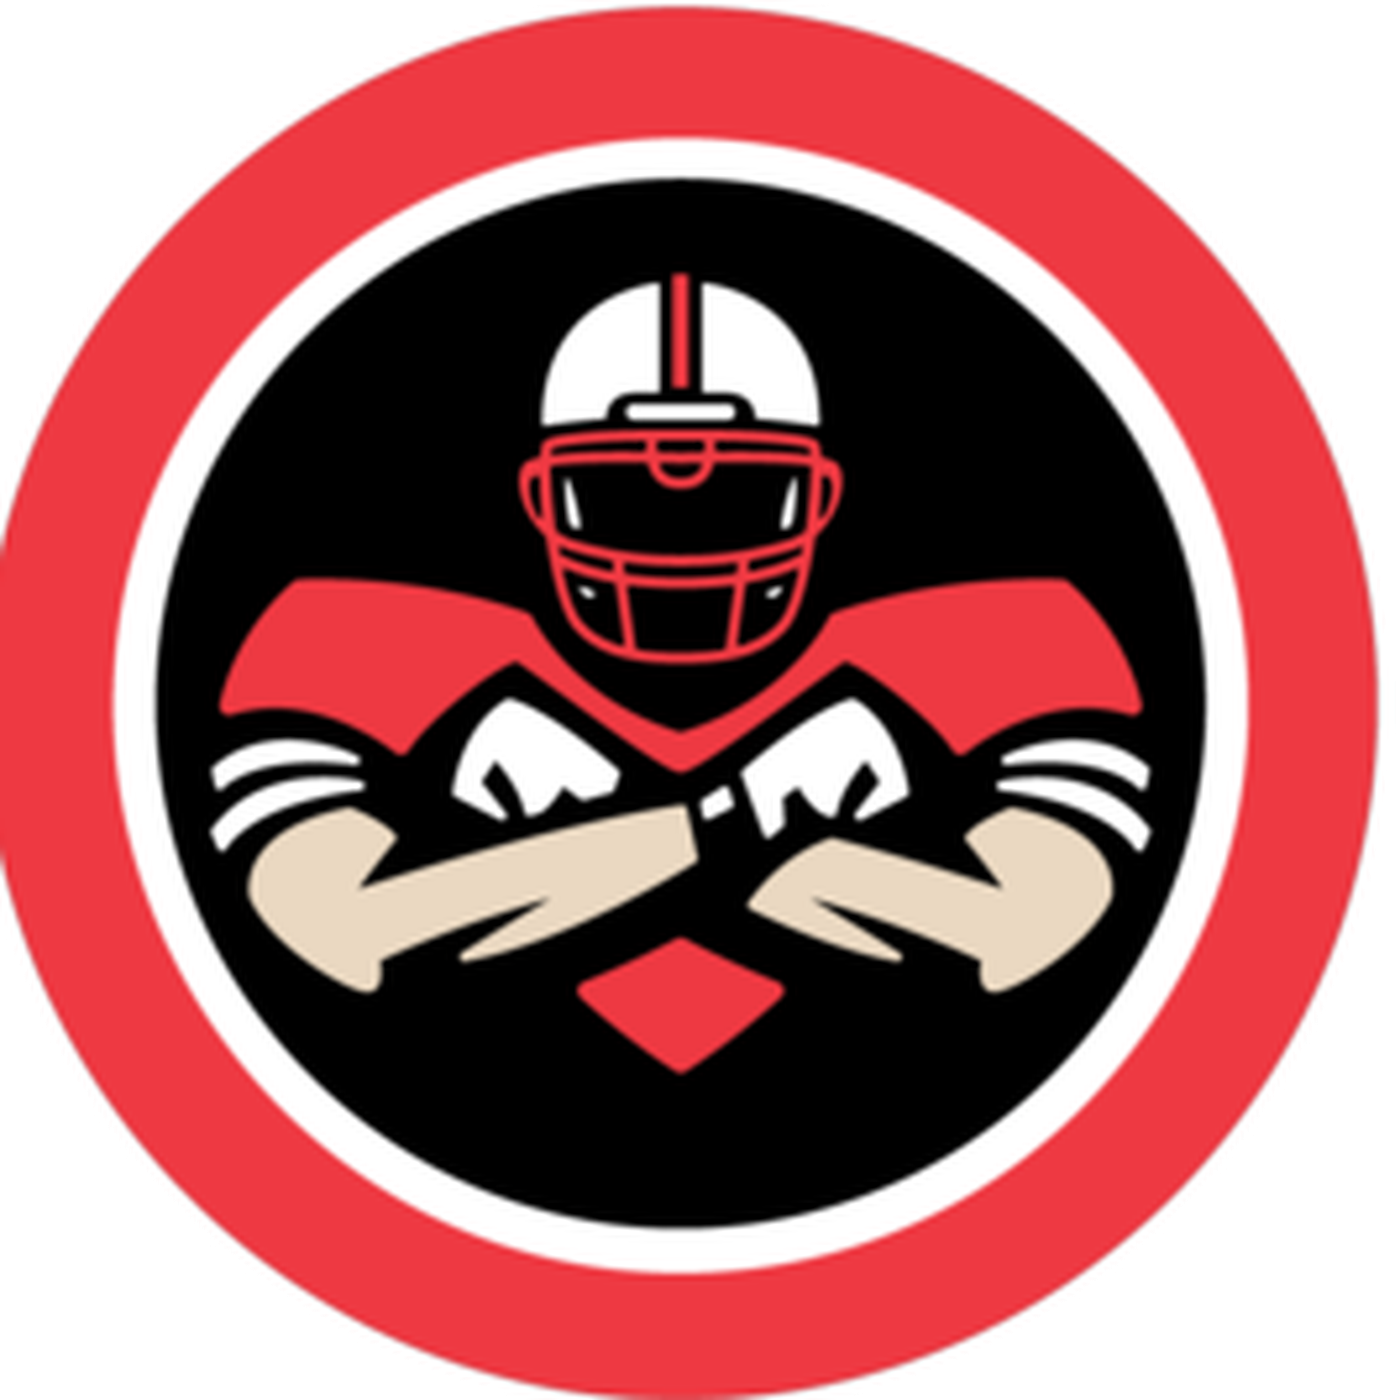 Husker football clipart vector royalty free download Understanding College Football Officiating - The Crew And Their Keys ... vector royalty free download